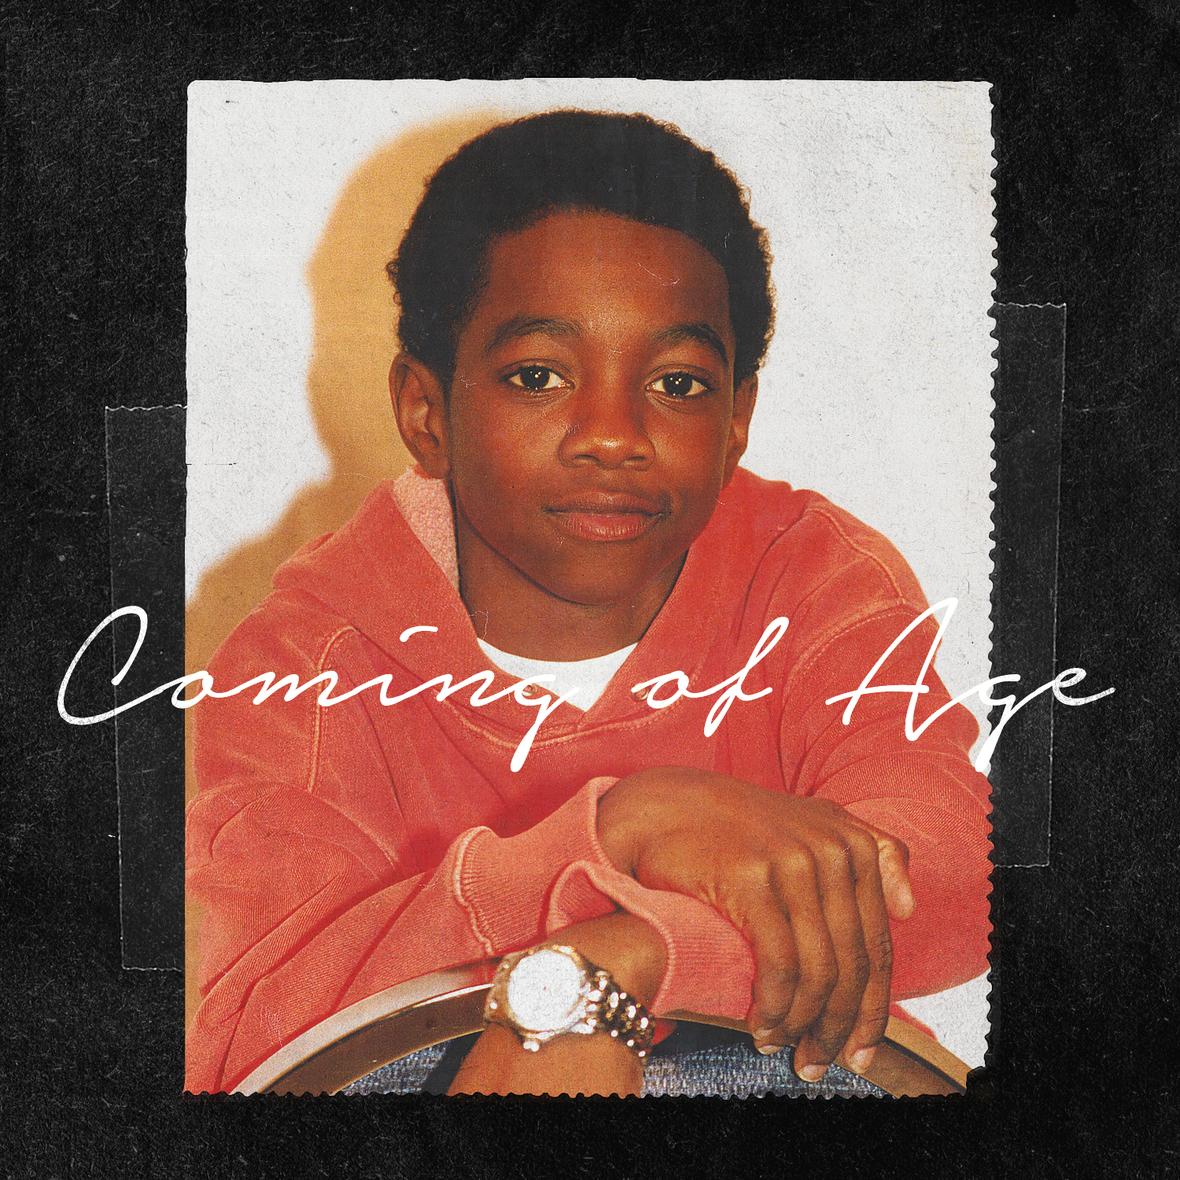 New Music: Sammie – Good Life (featuring Rick Ross)